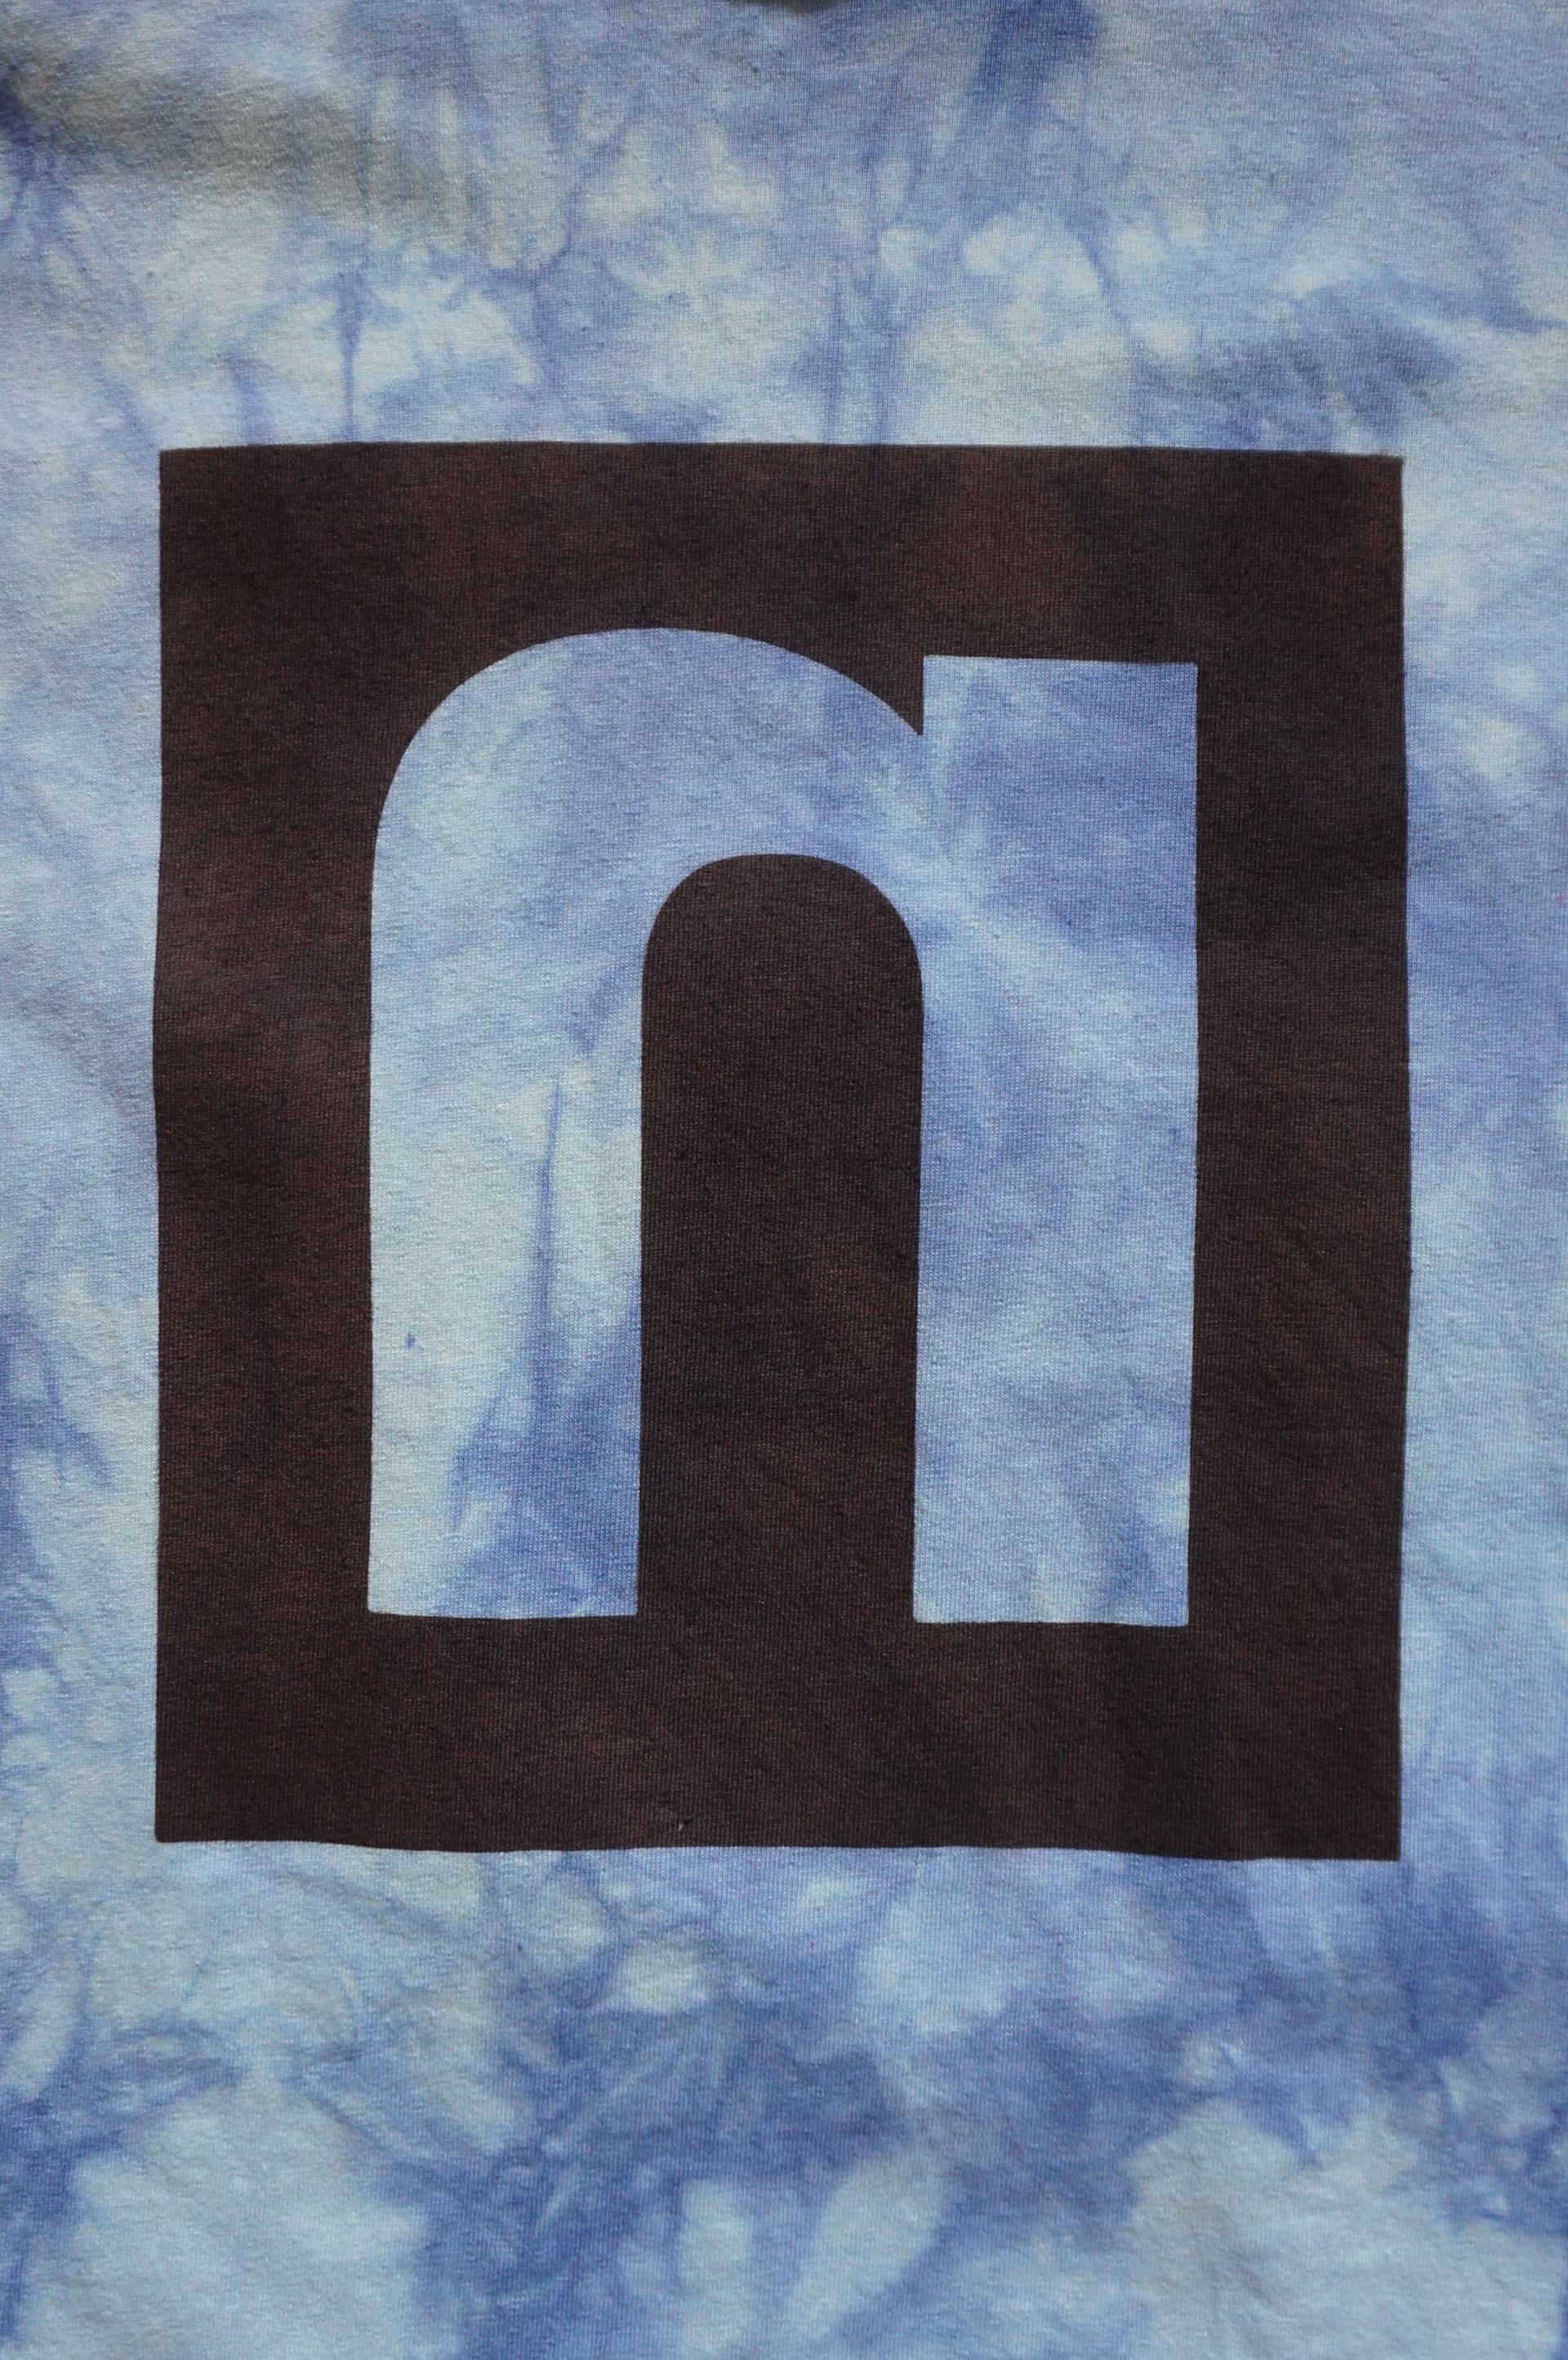 NEUTRAL ニュートラル 9tn anniversary 9周年 stencil ステンシルTシャツ tiedye タイダイ